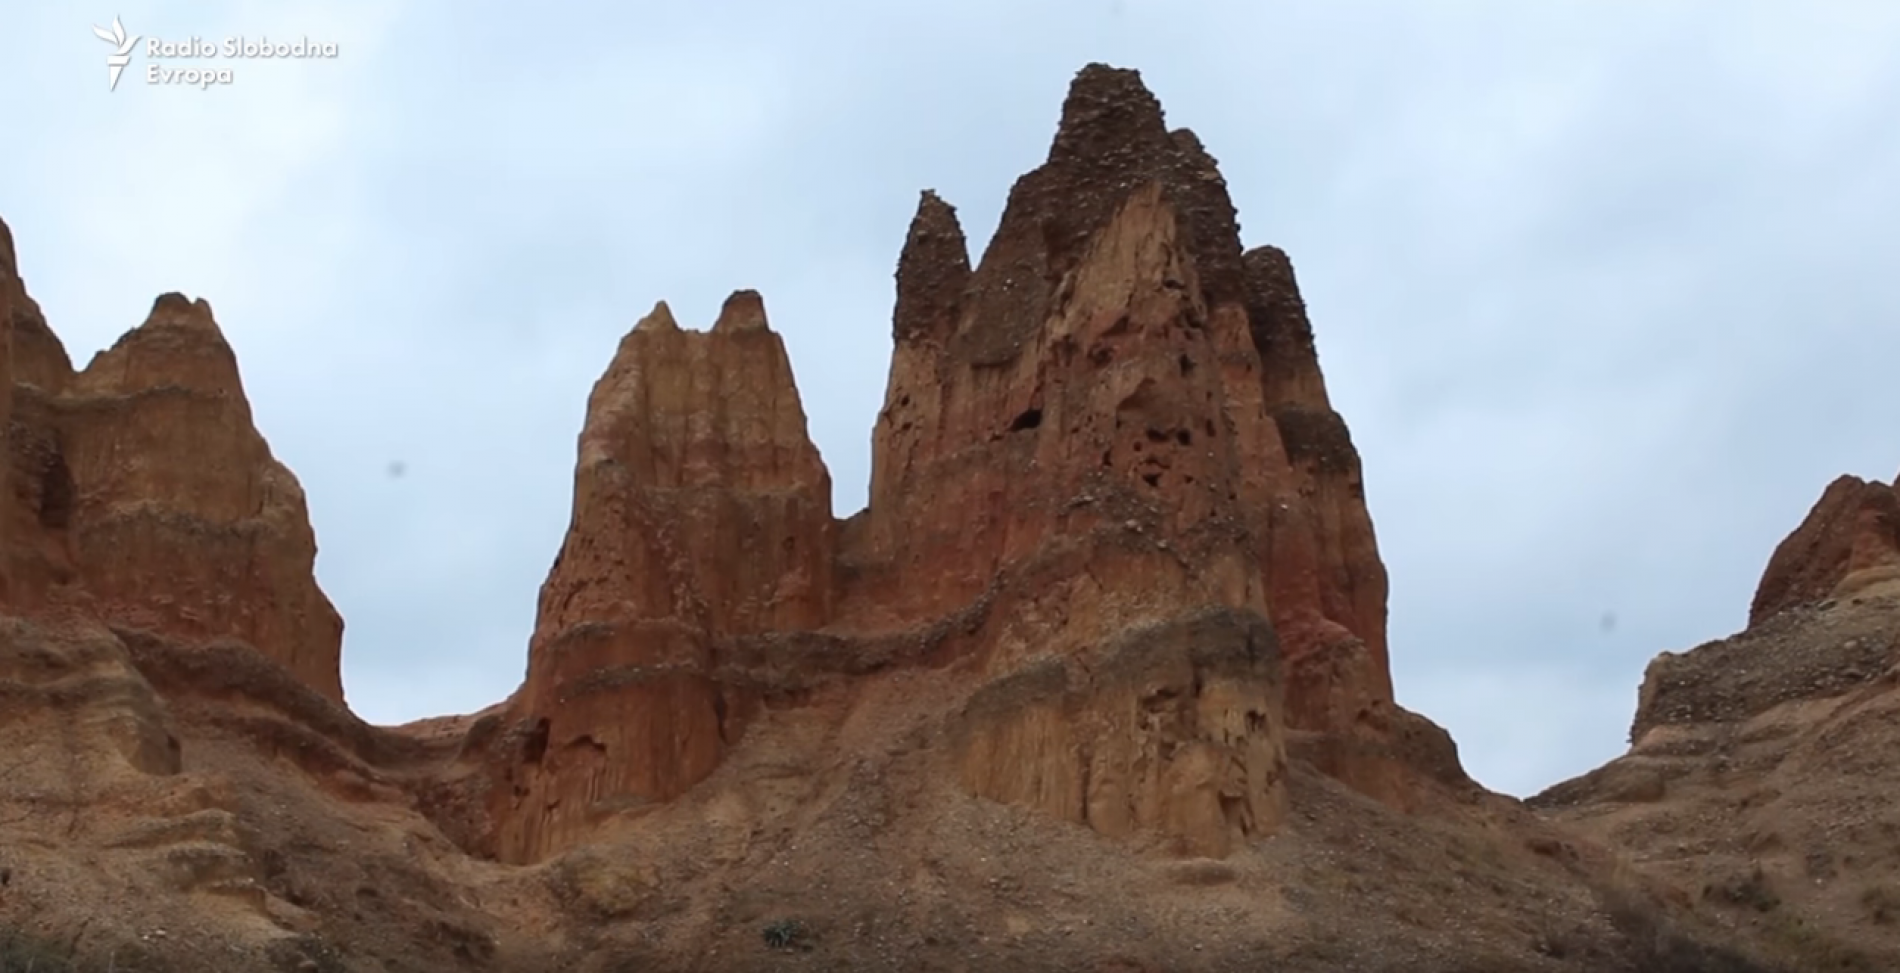 Foča: Pješčane piramide (Video)